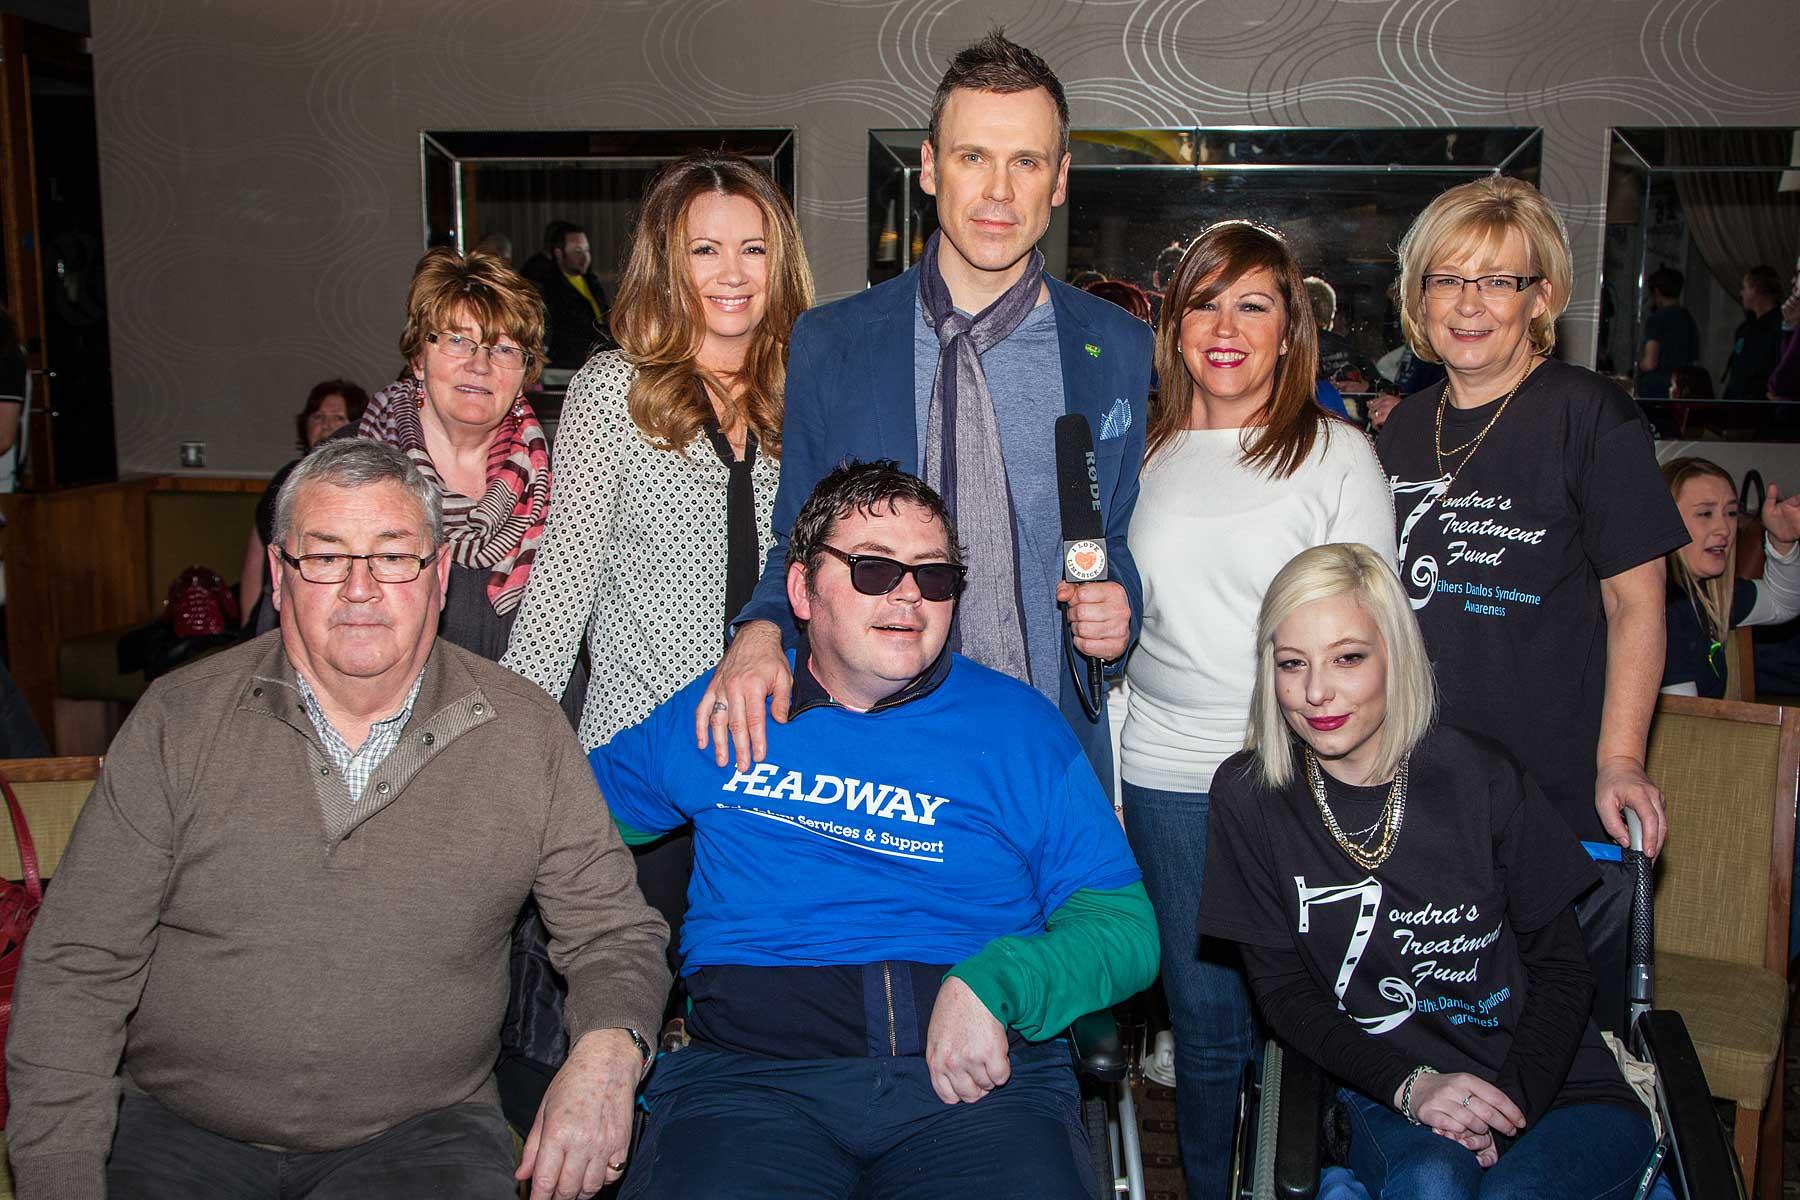 New ABI Ireland campaign and hopeful Bionic leg for Brian